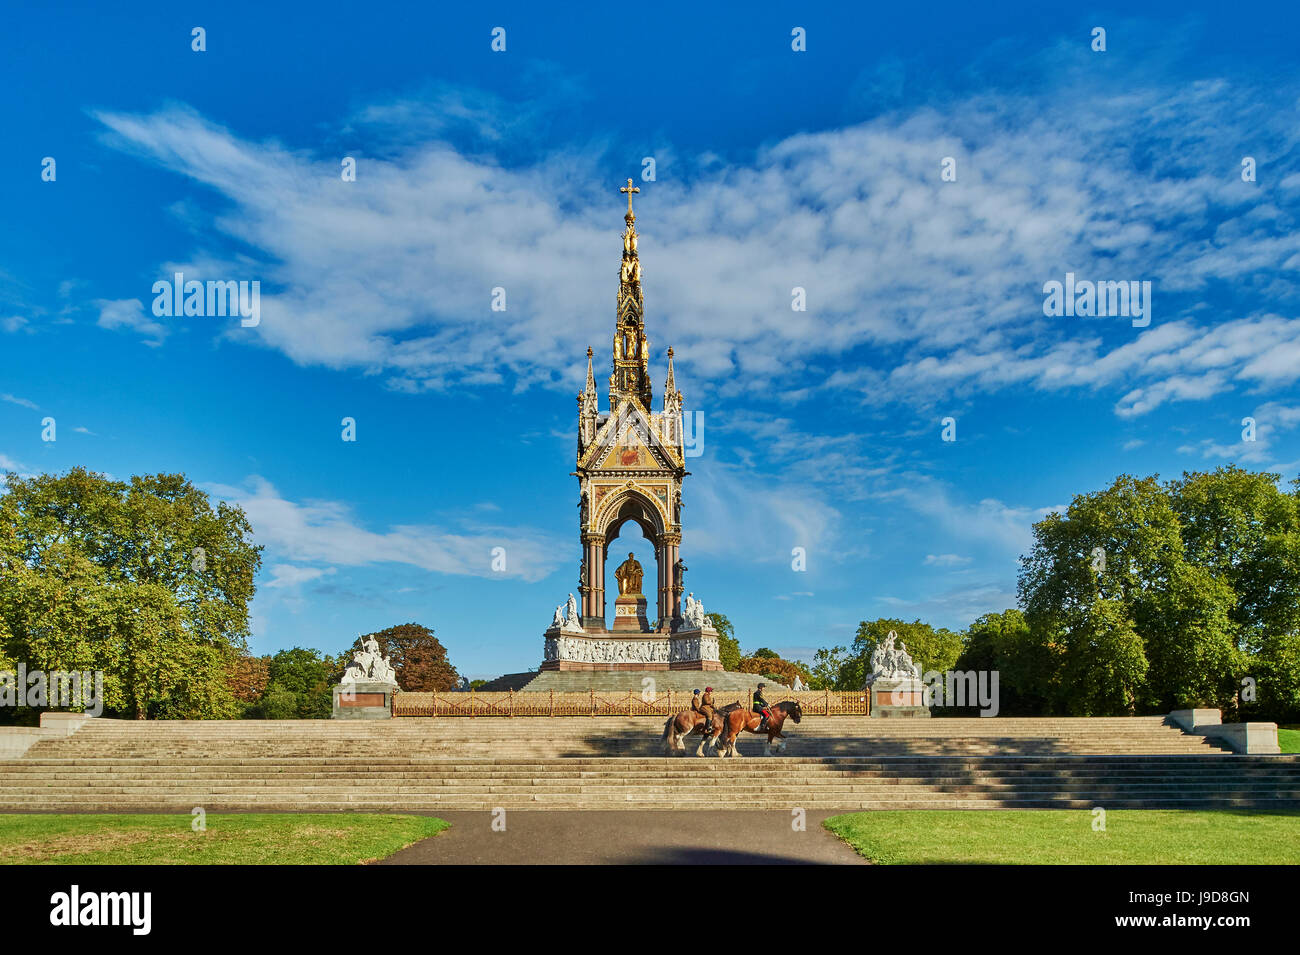 Three heavy horses are ridden past The Albert Memorial, Kensington Gardens, Hyde Park, London, England, United Kingdom, - Stock Image